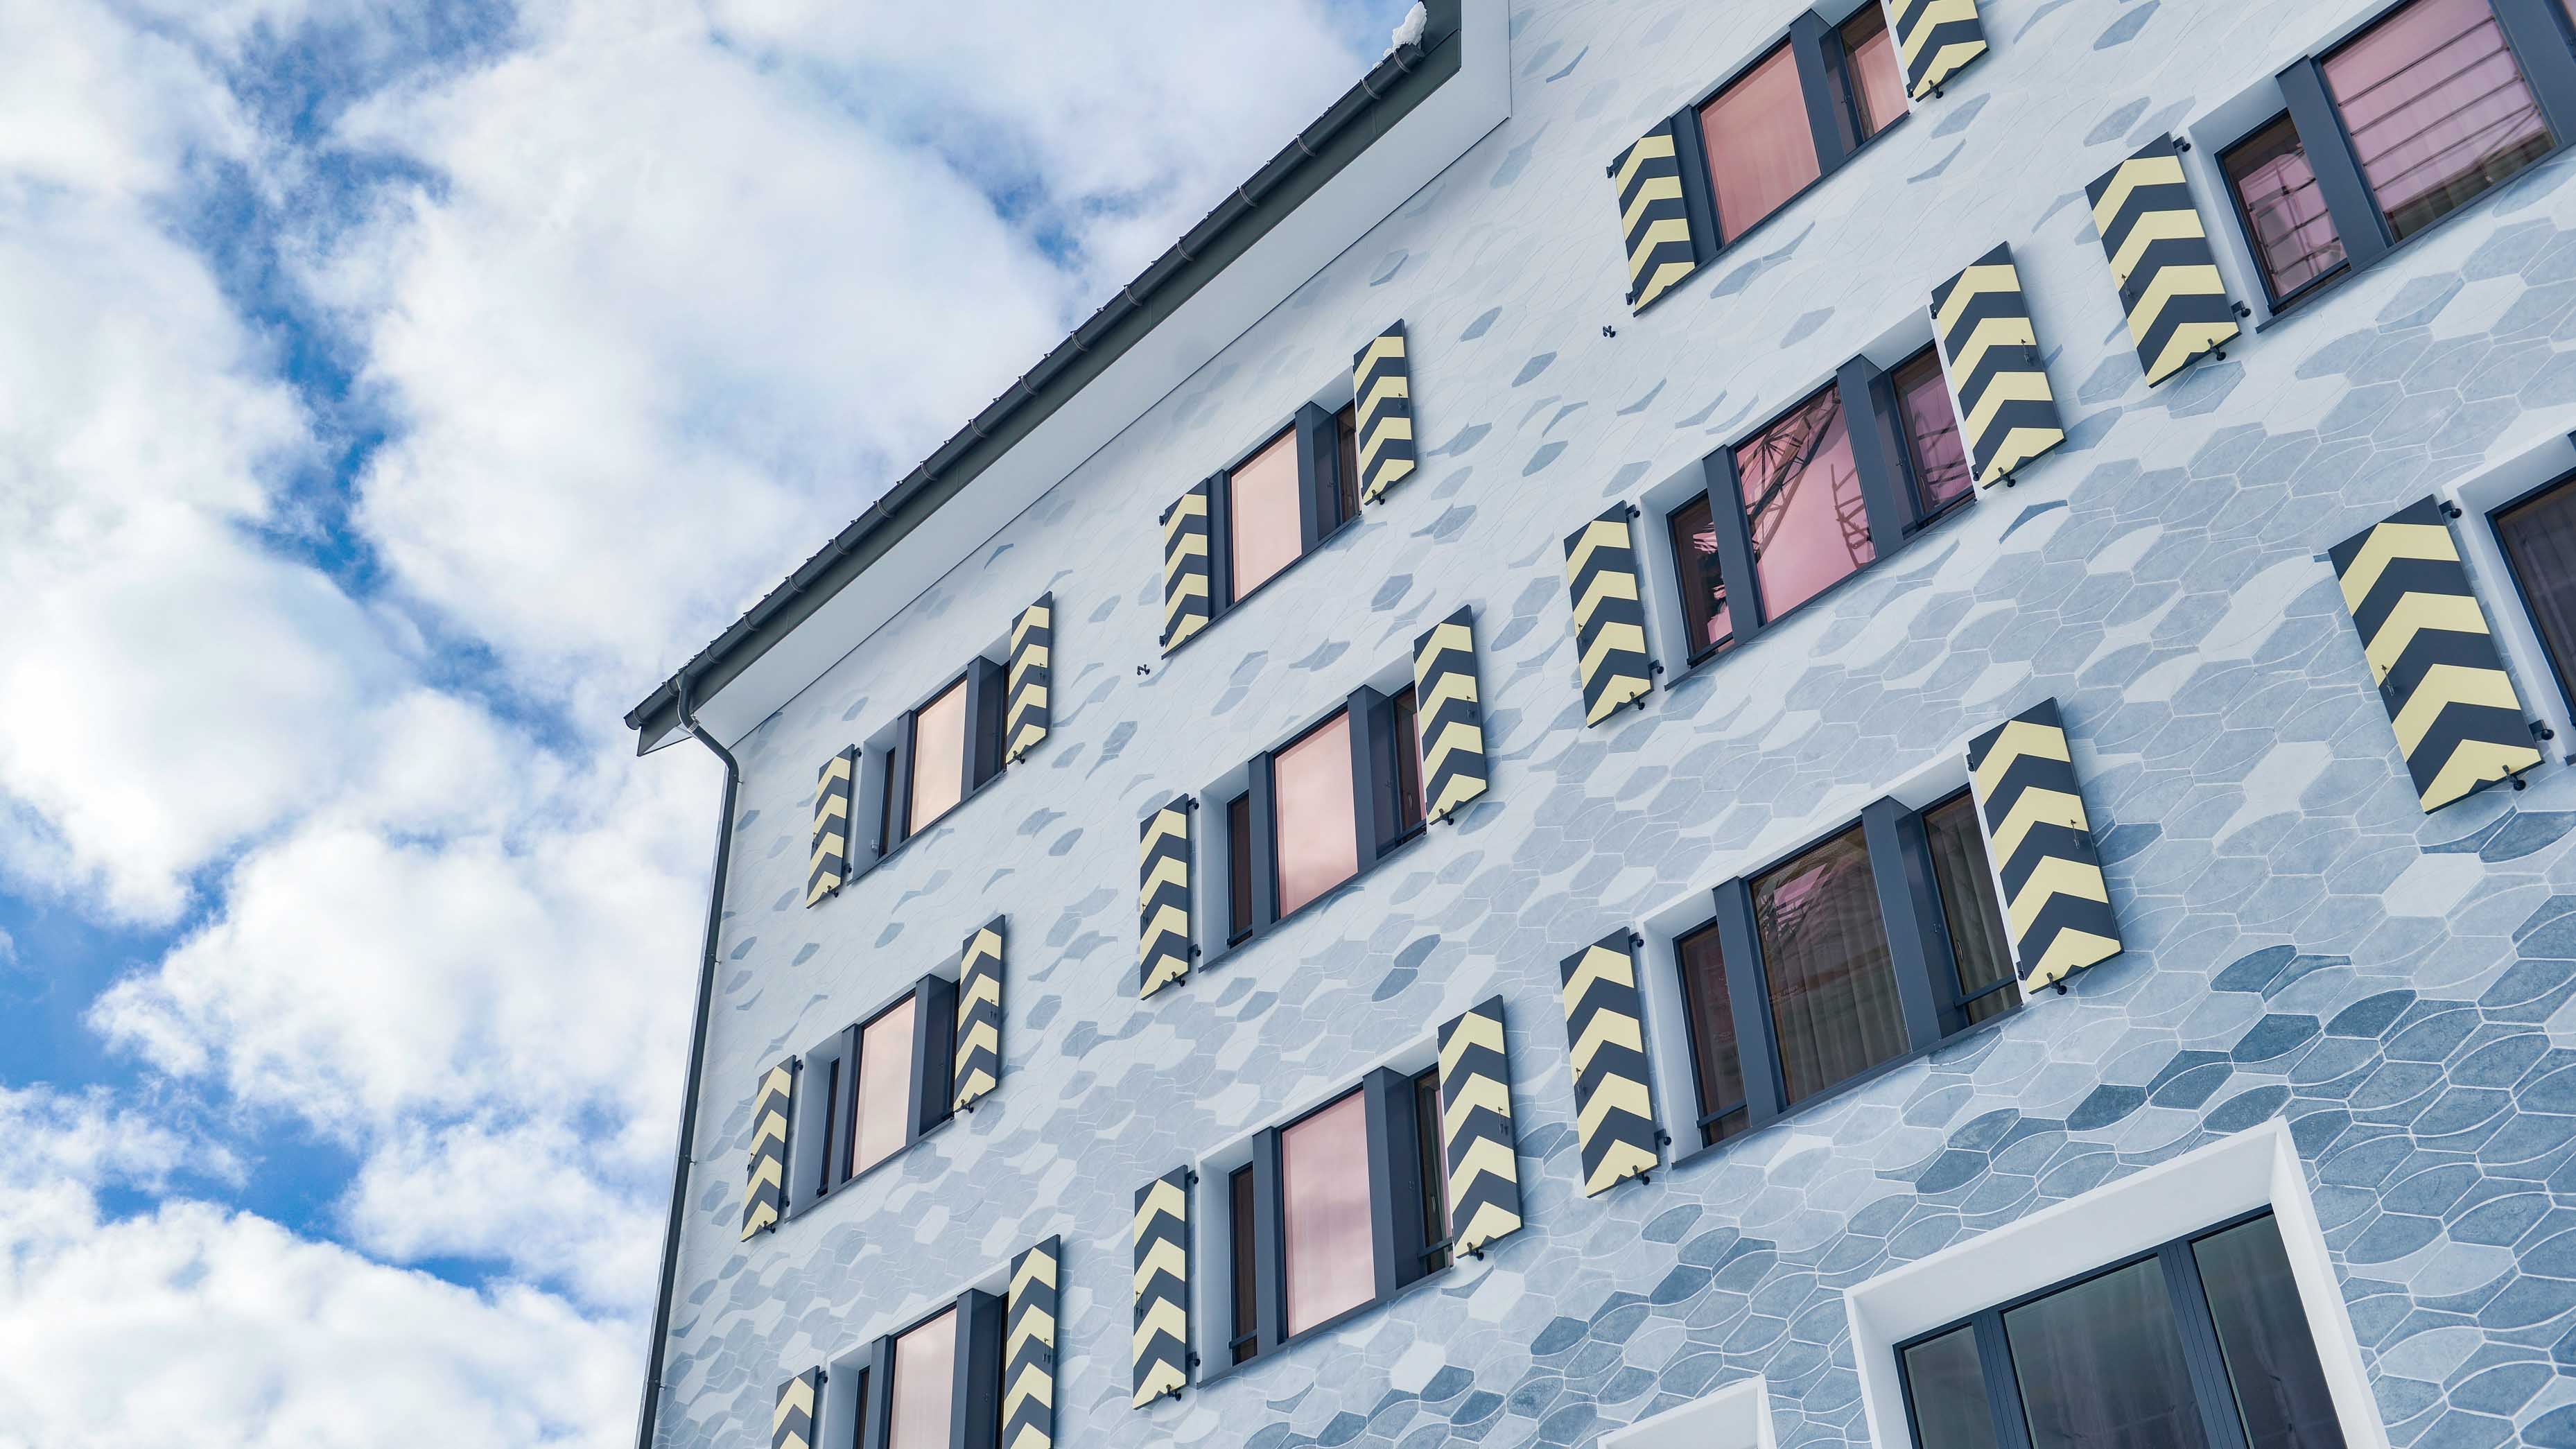 Haus Edelweiss Apartments, Switzerland